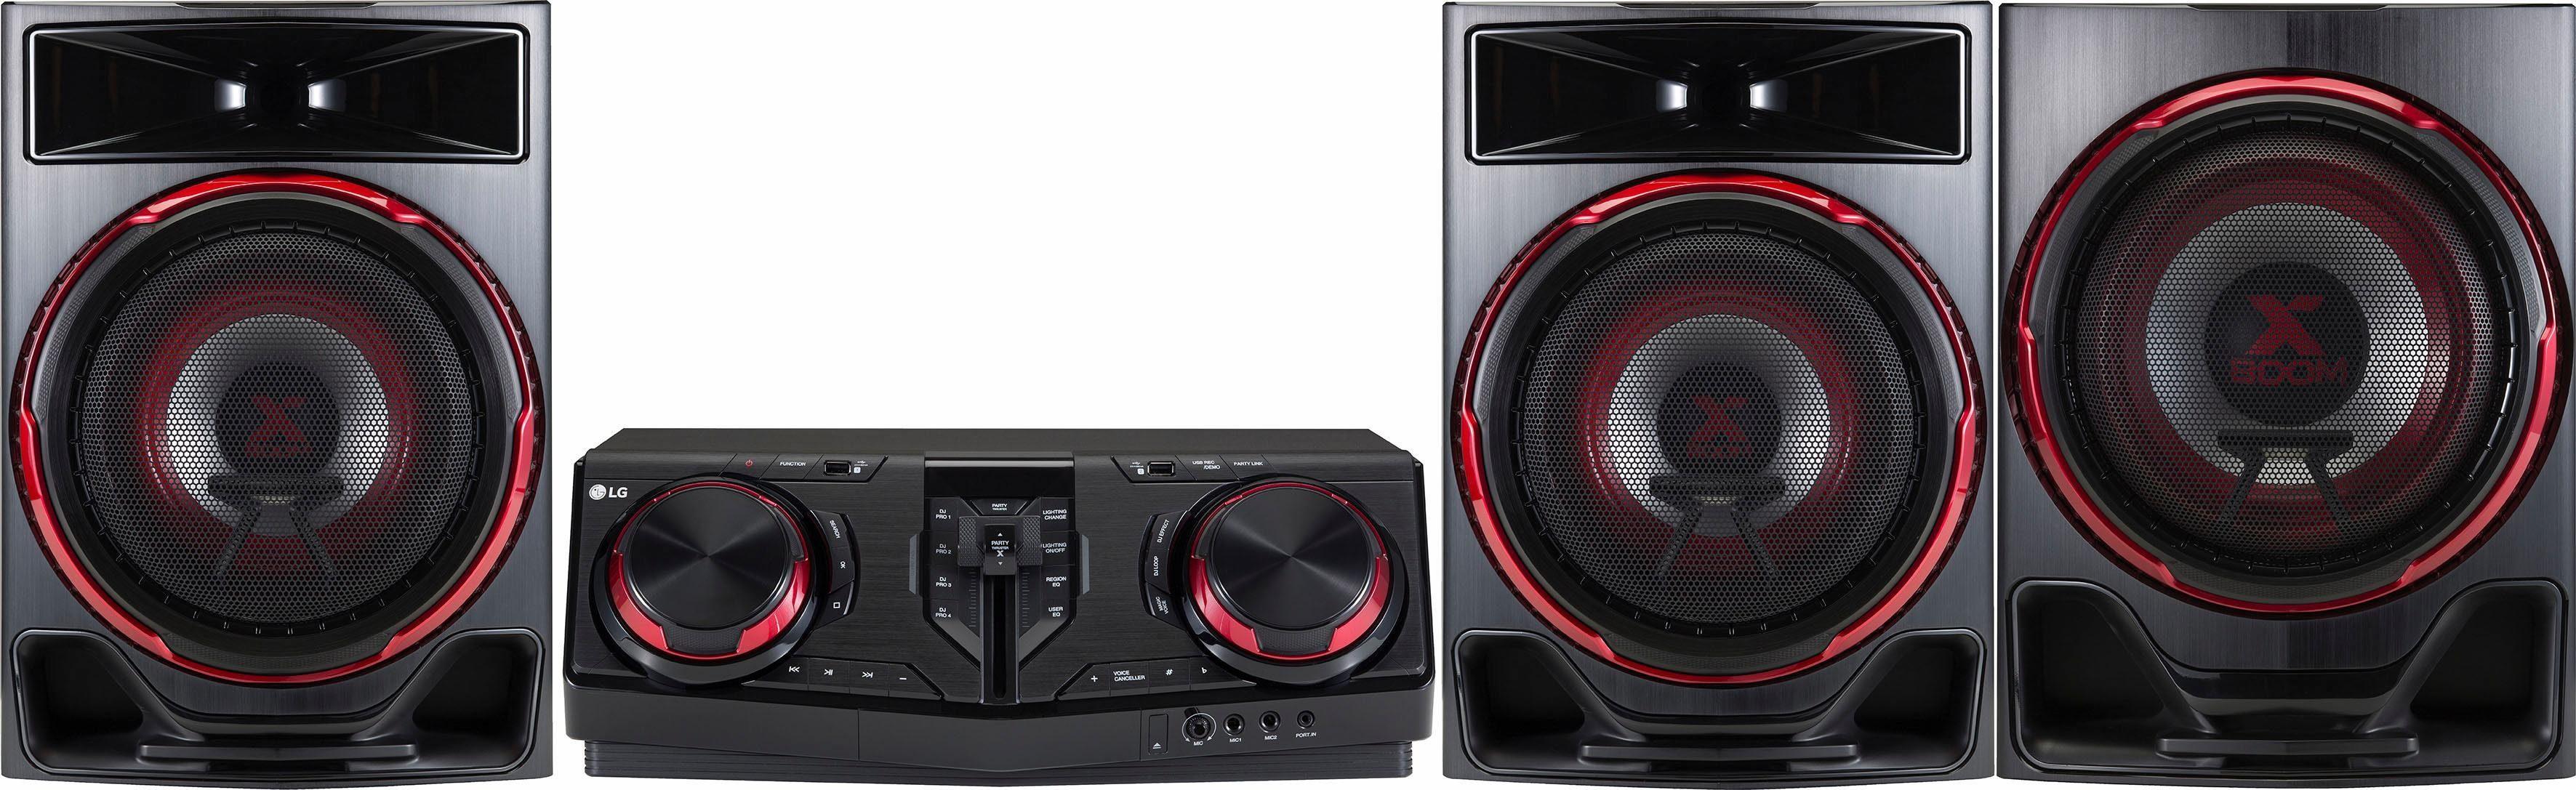 LG CJ88 Stereoanlage, Bluetooth, RDS, 2x USB